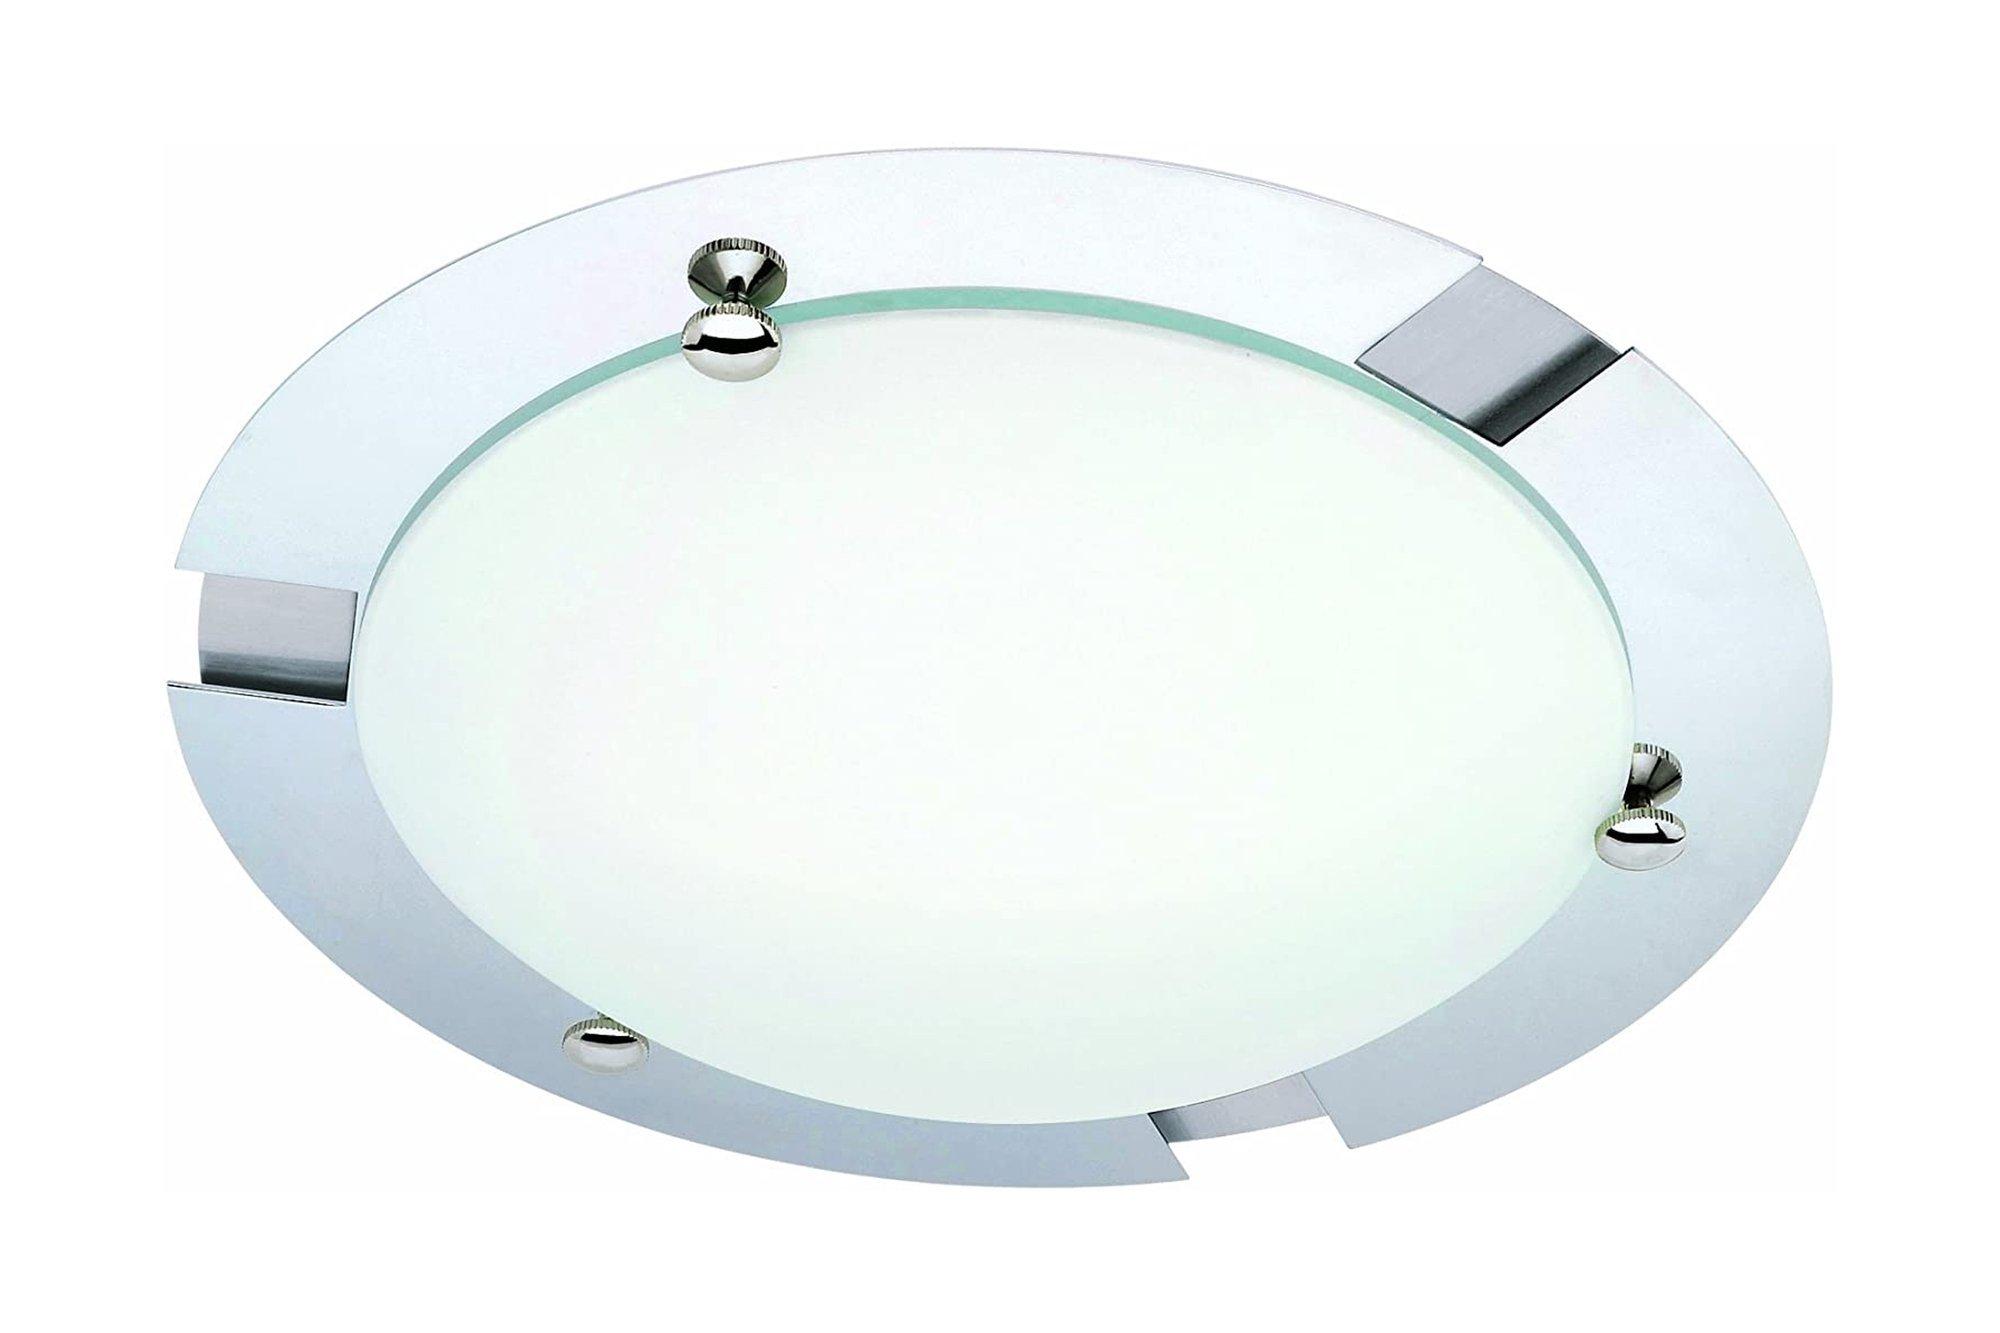 Bathroom ceiling Briloner Splash 2120-018 1xE27 / 60W